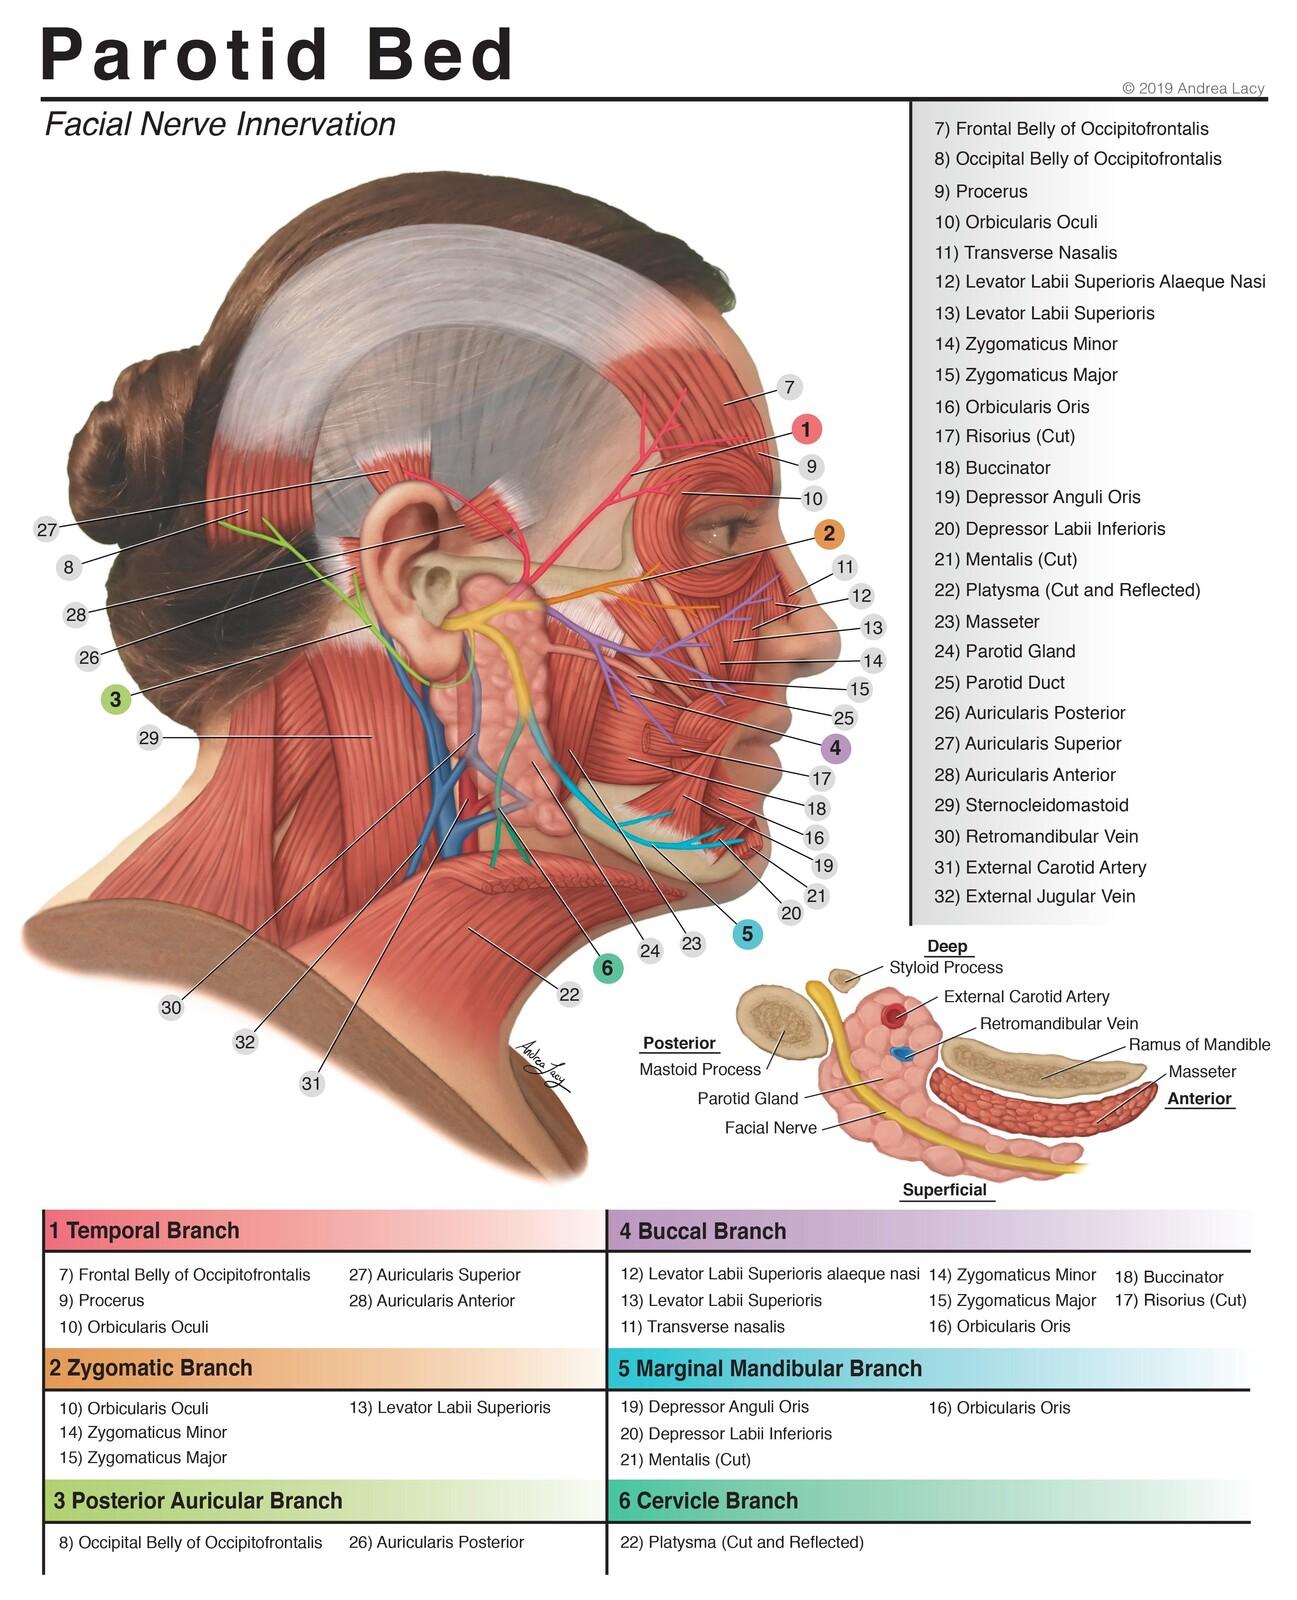 Parotid Bed Anatomy- Facial Nerve Innervation